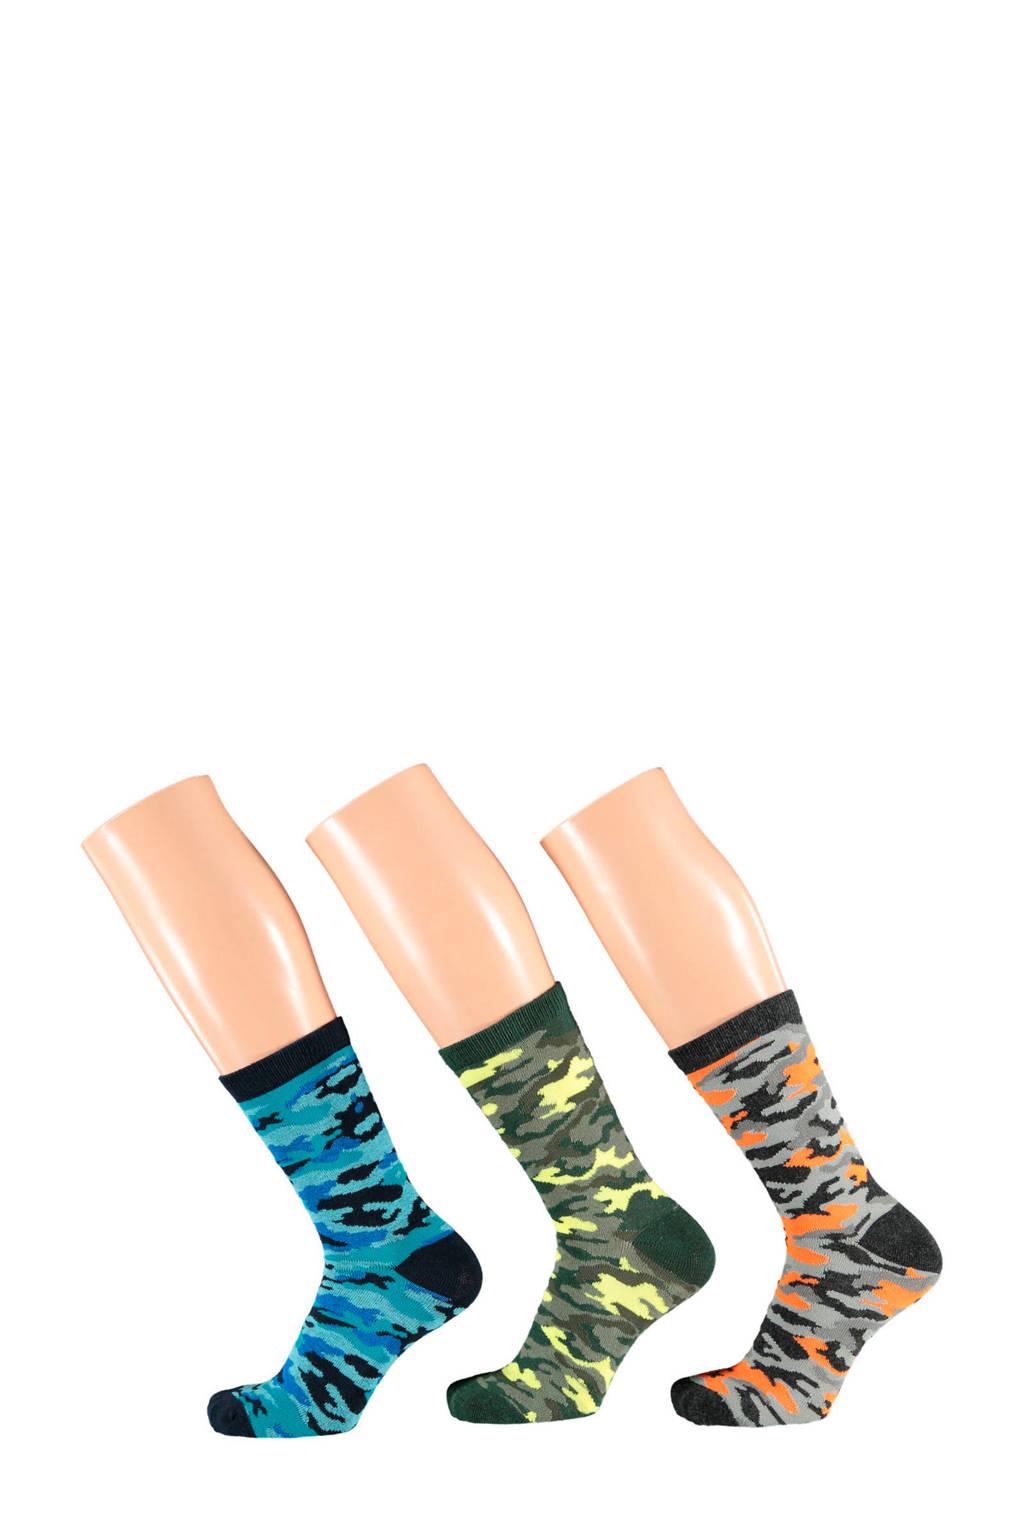 Apollo sokken set v an 3 paar, Multicolor